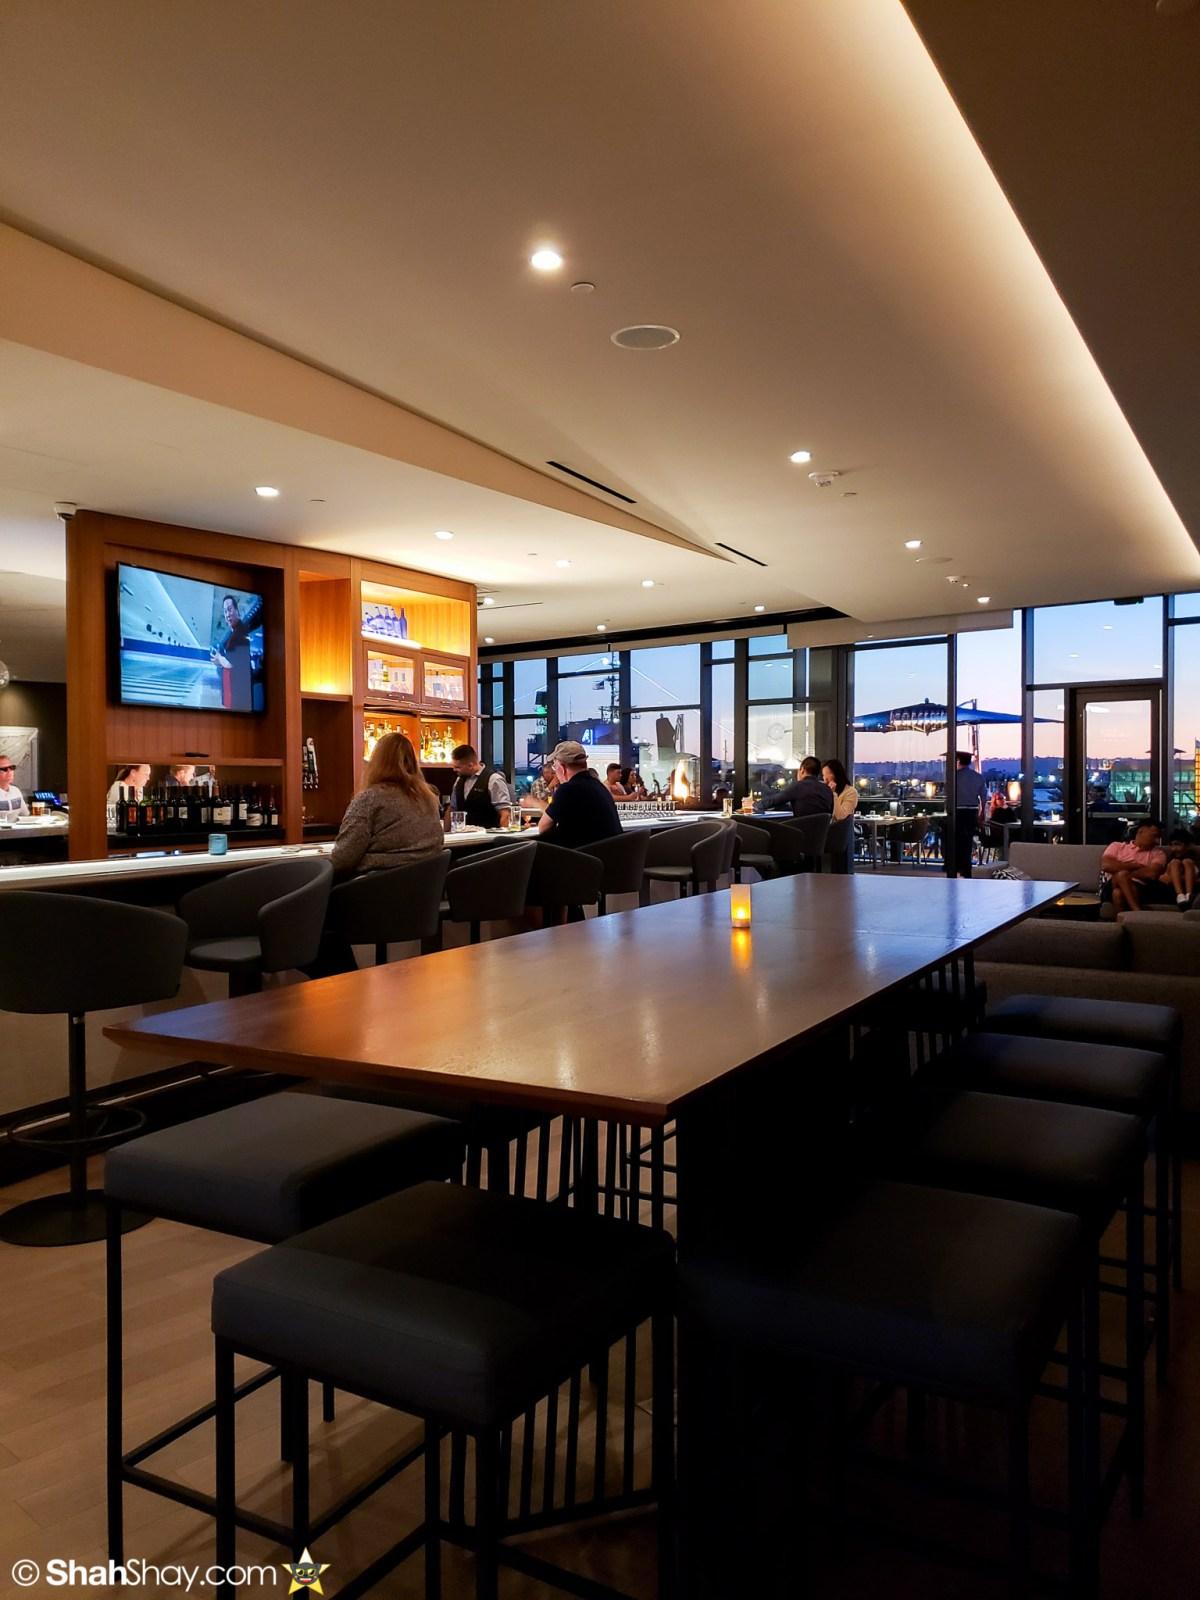 InterContinental San Diego - Vistal Bar + Restaurant